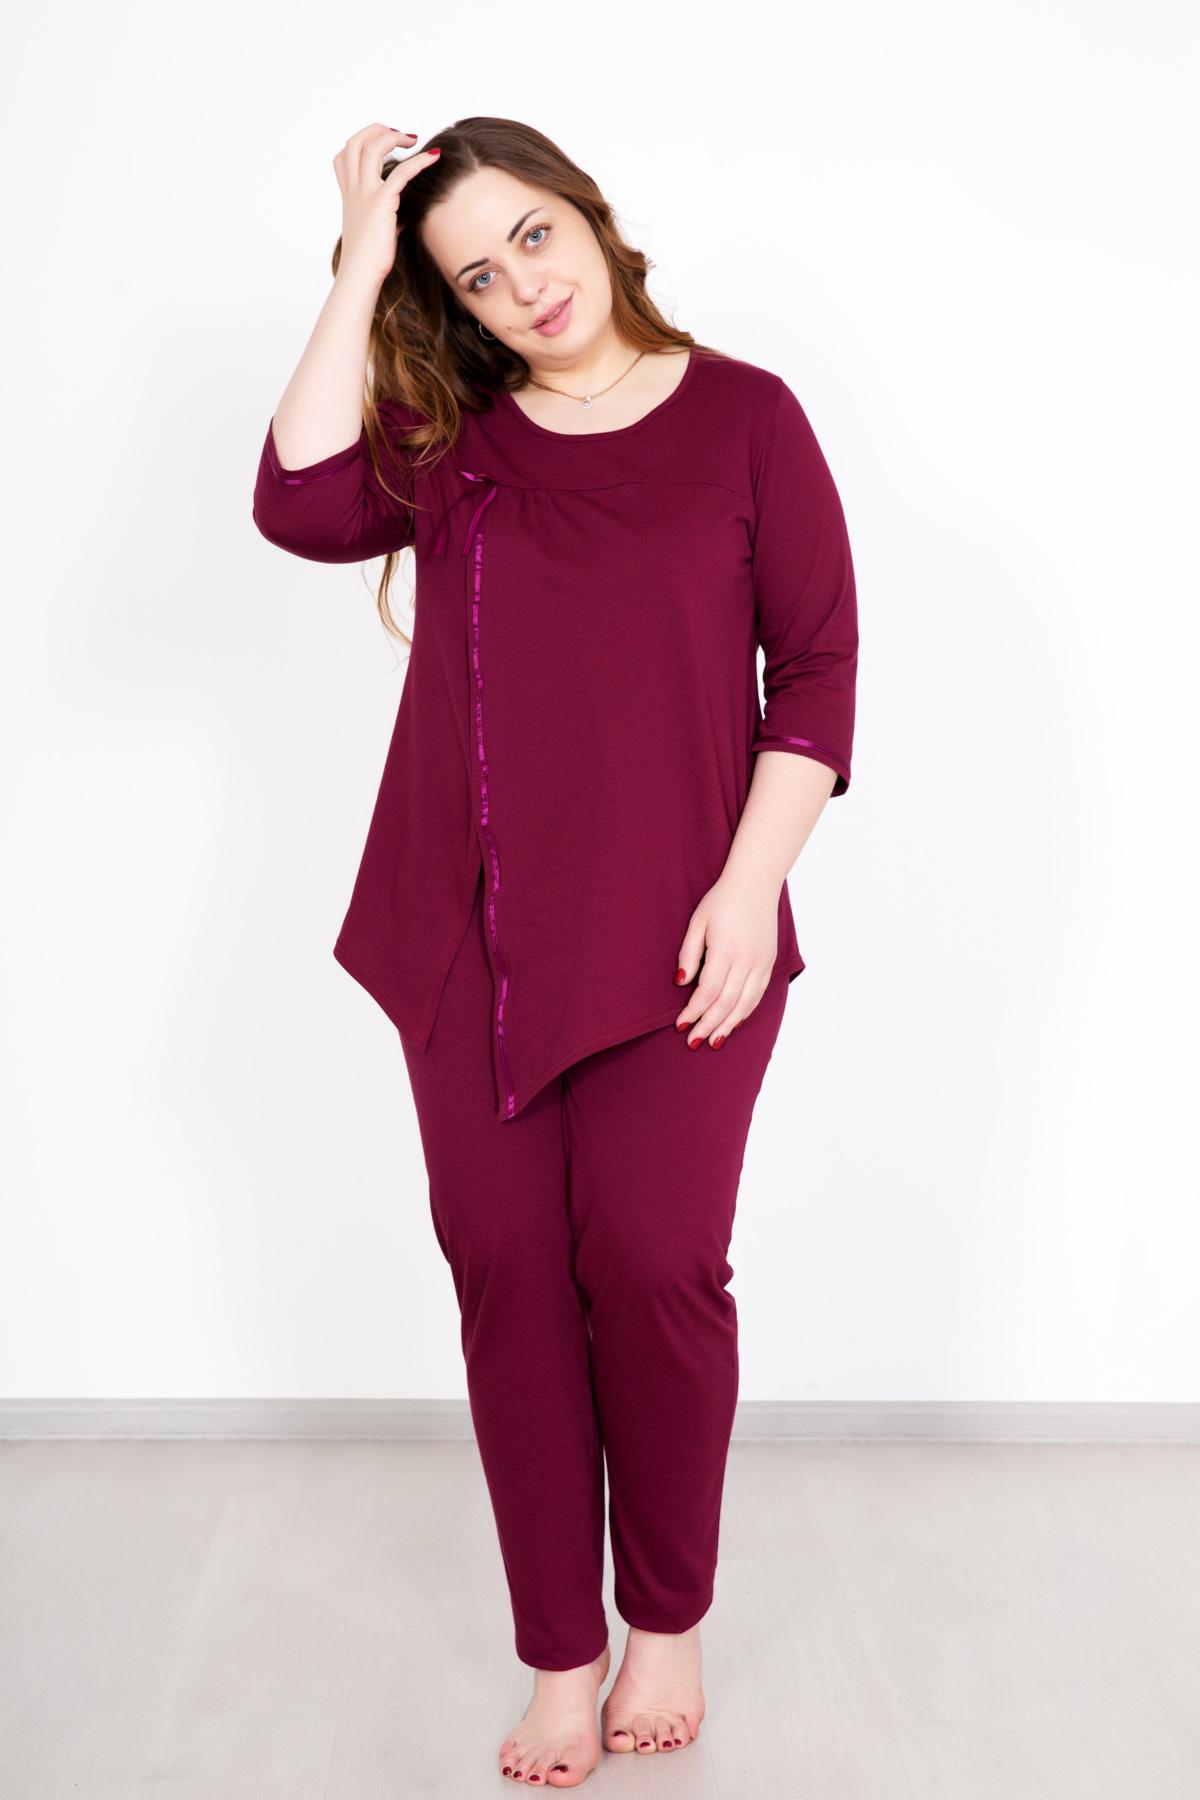 Жен. костюм  Катарина  Бордо р. 58 - Текстиль для здоровья артикул: 33435